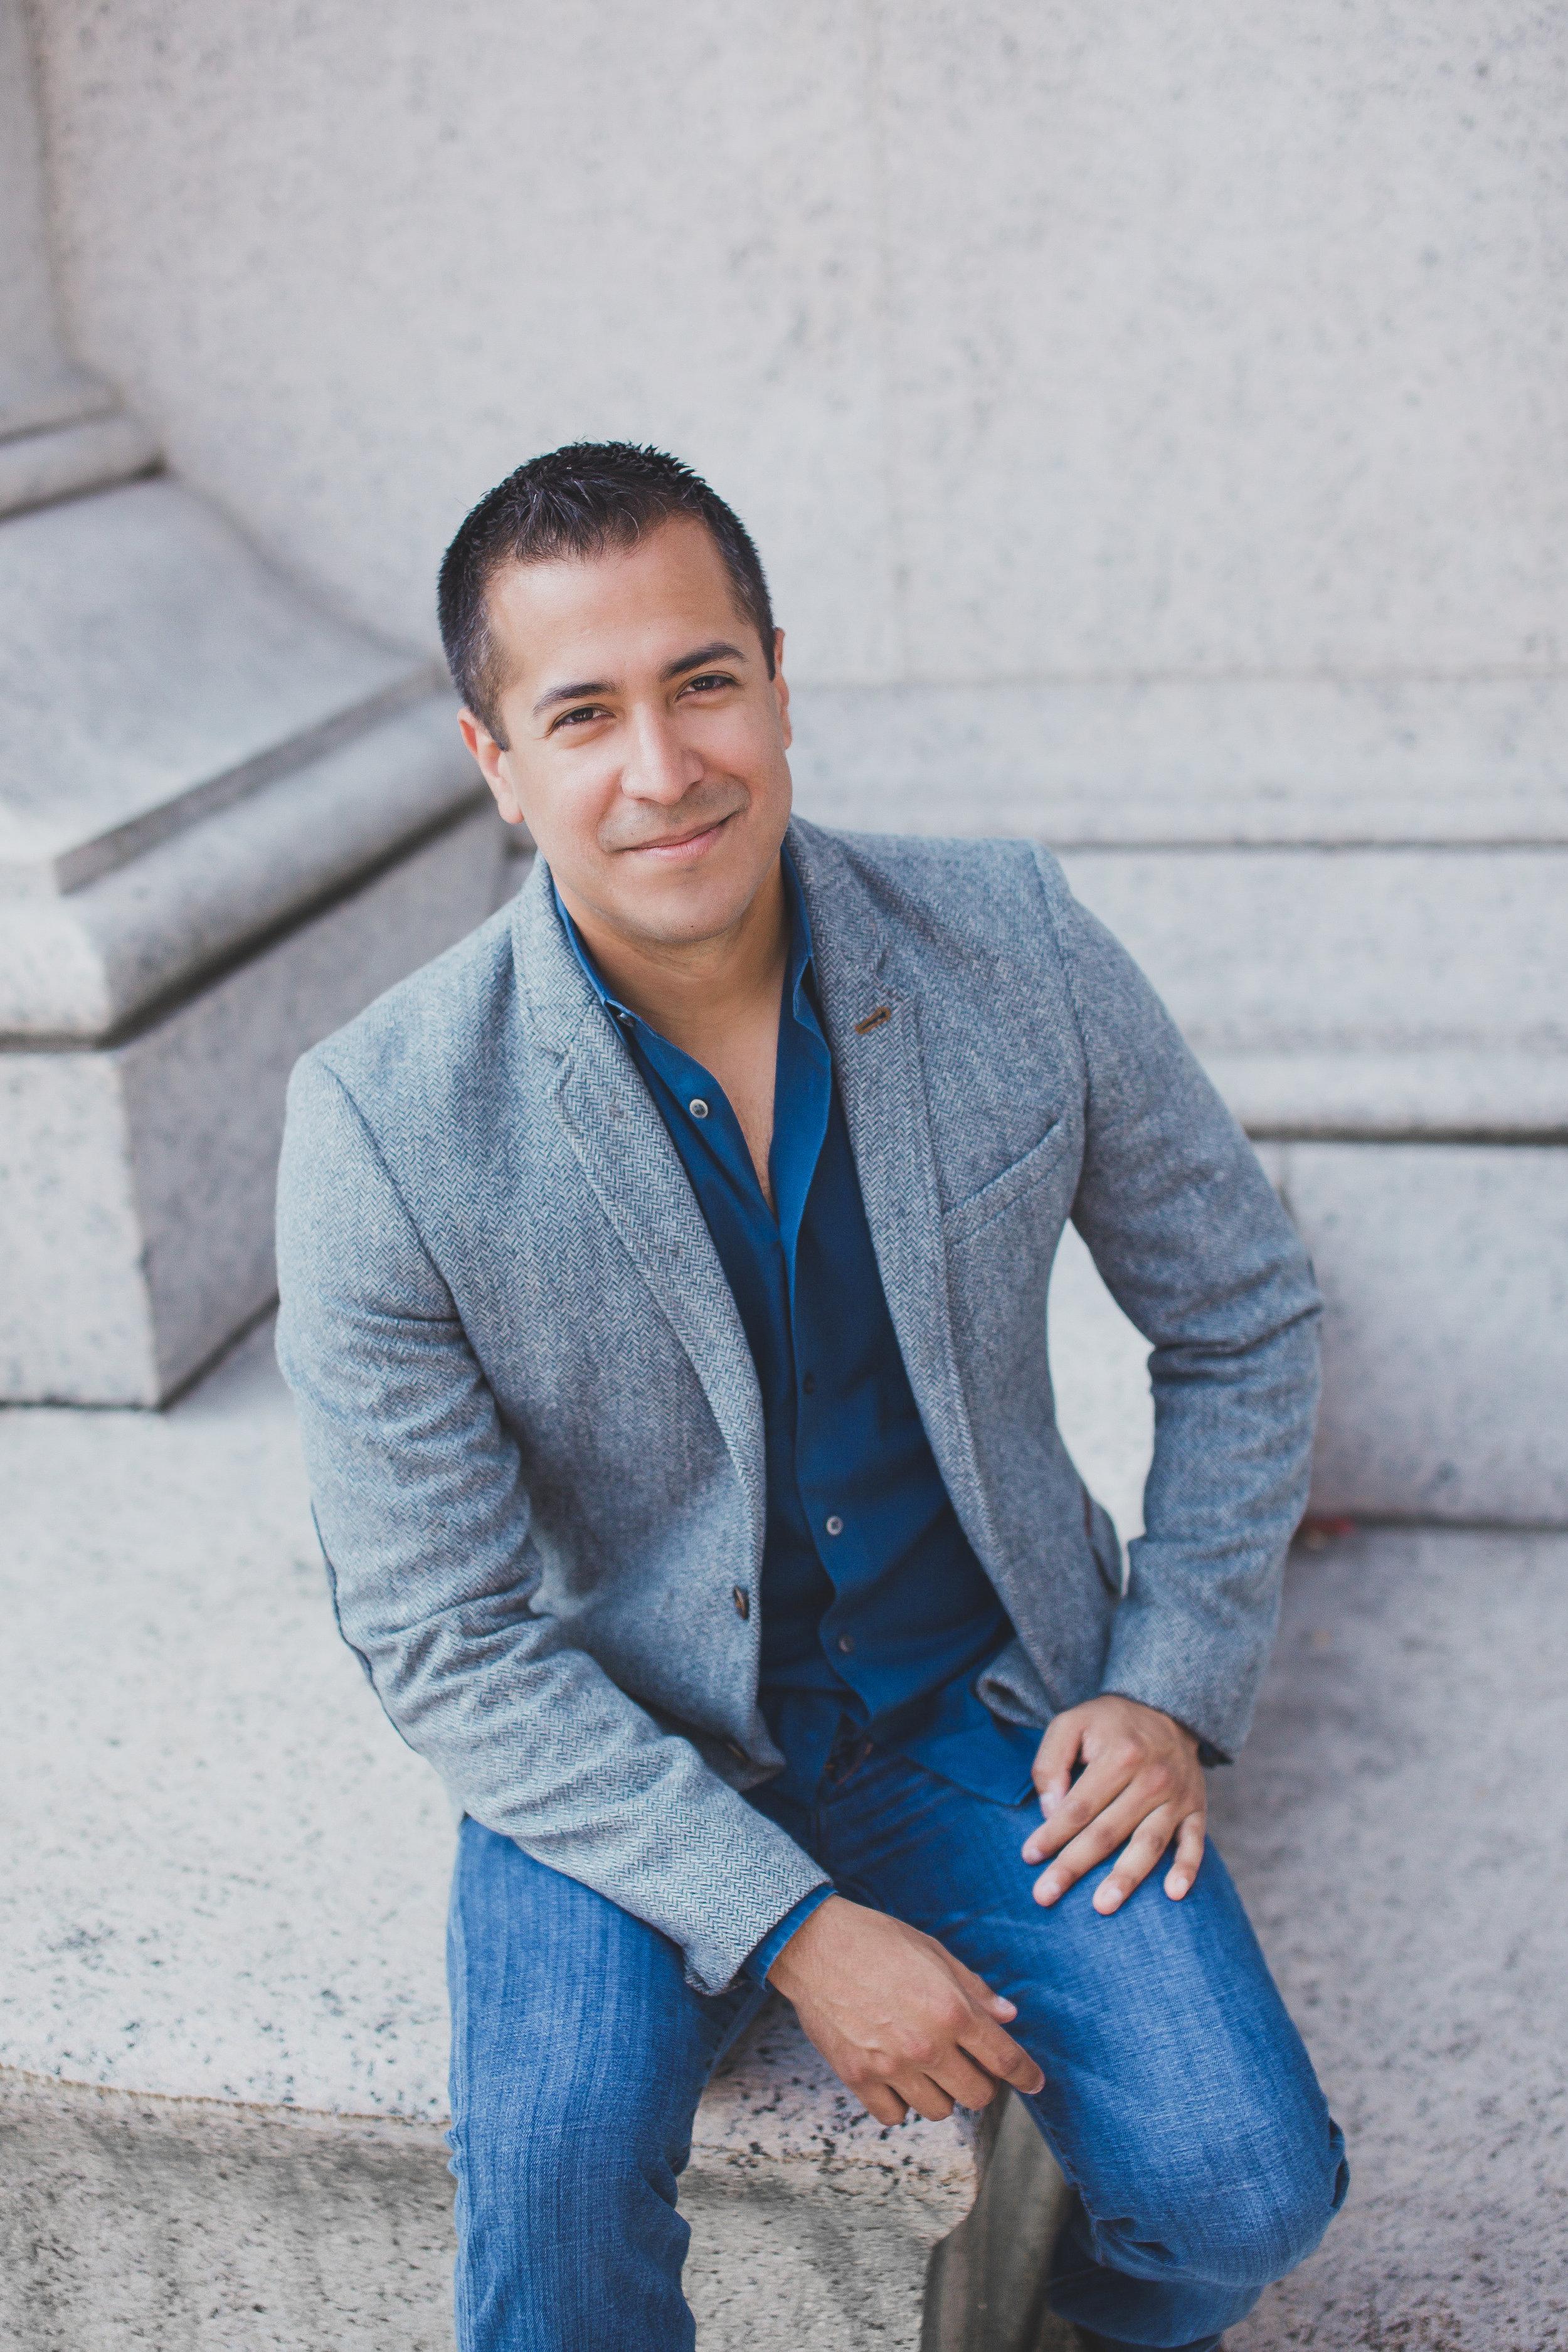 Andrew Garcia, co-founder of GoodShuffle